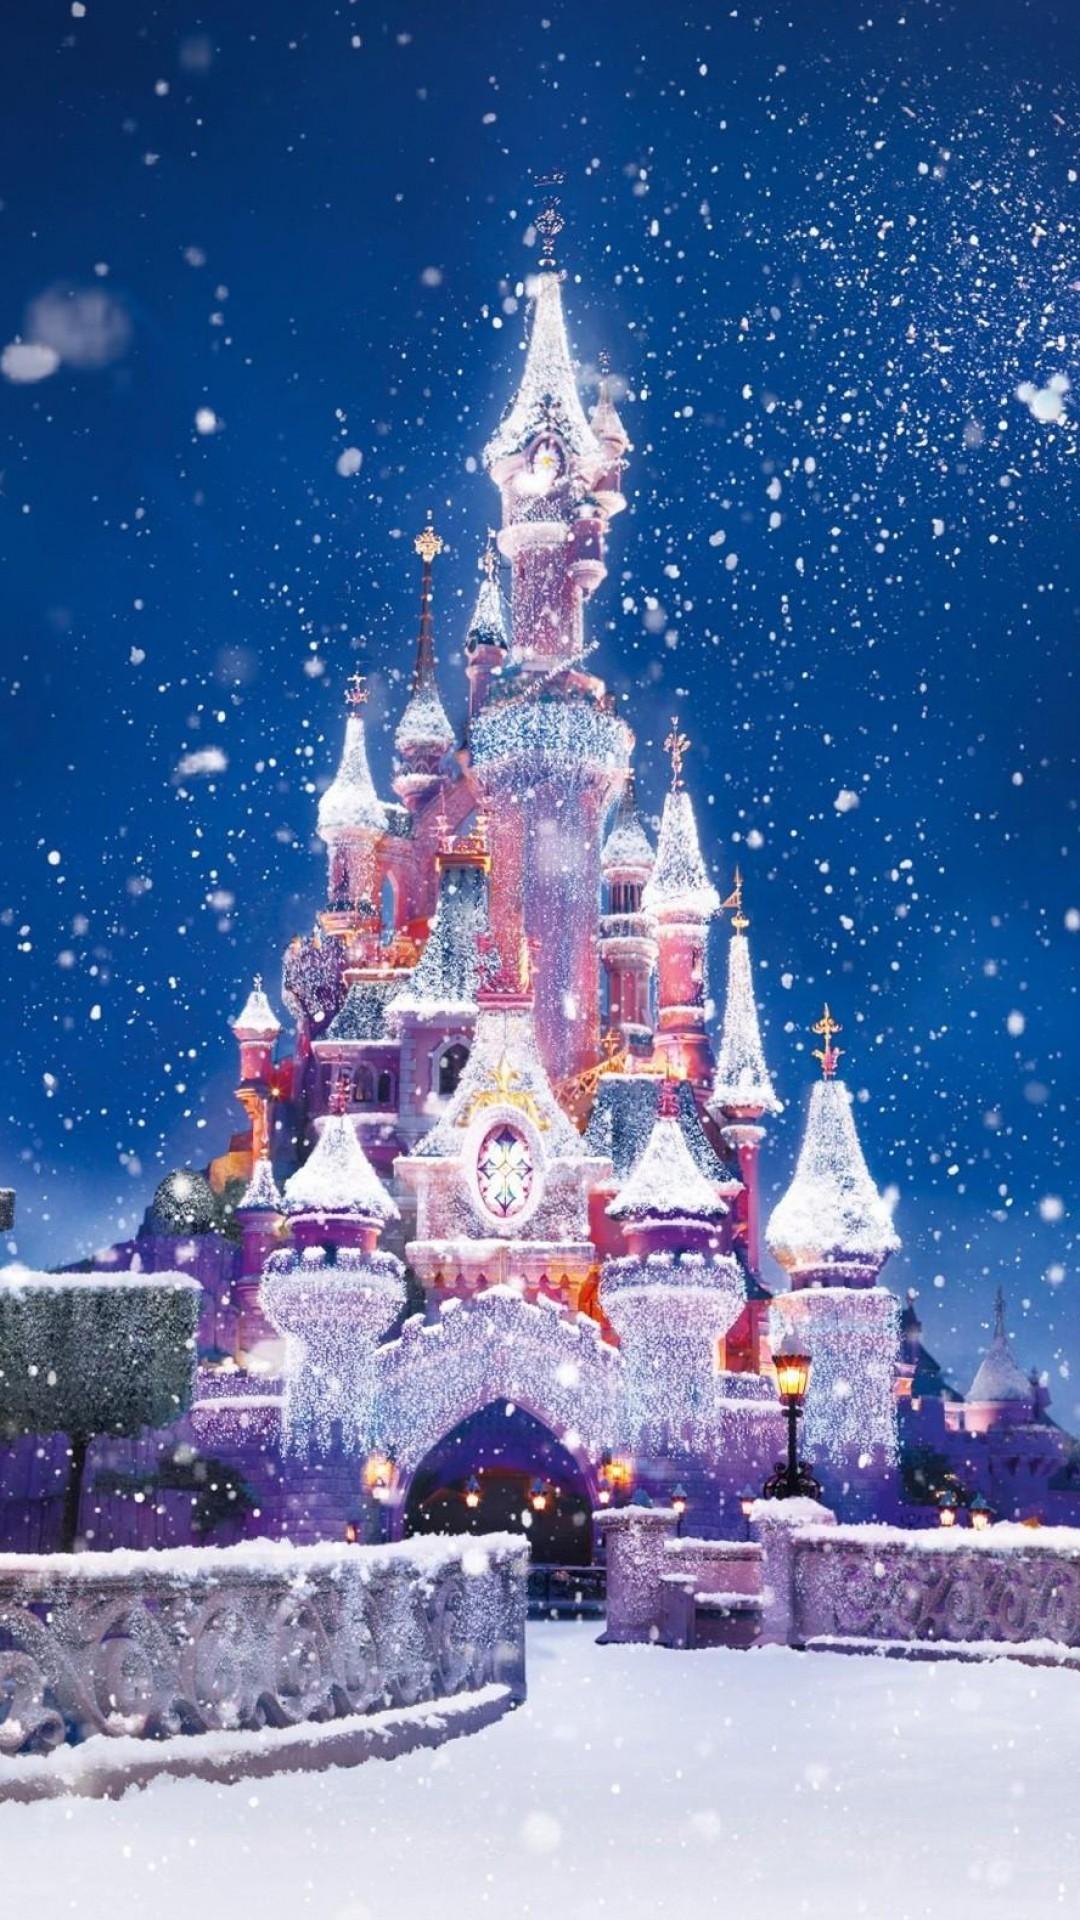 Disney Castle Christmas Lights Snow Android Wallpaper.jpg